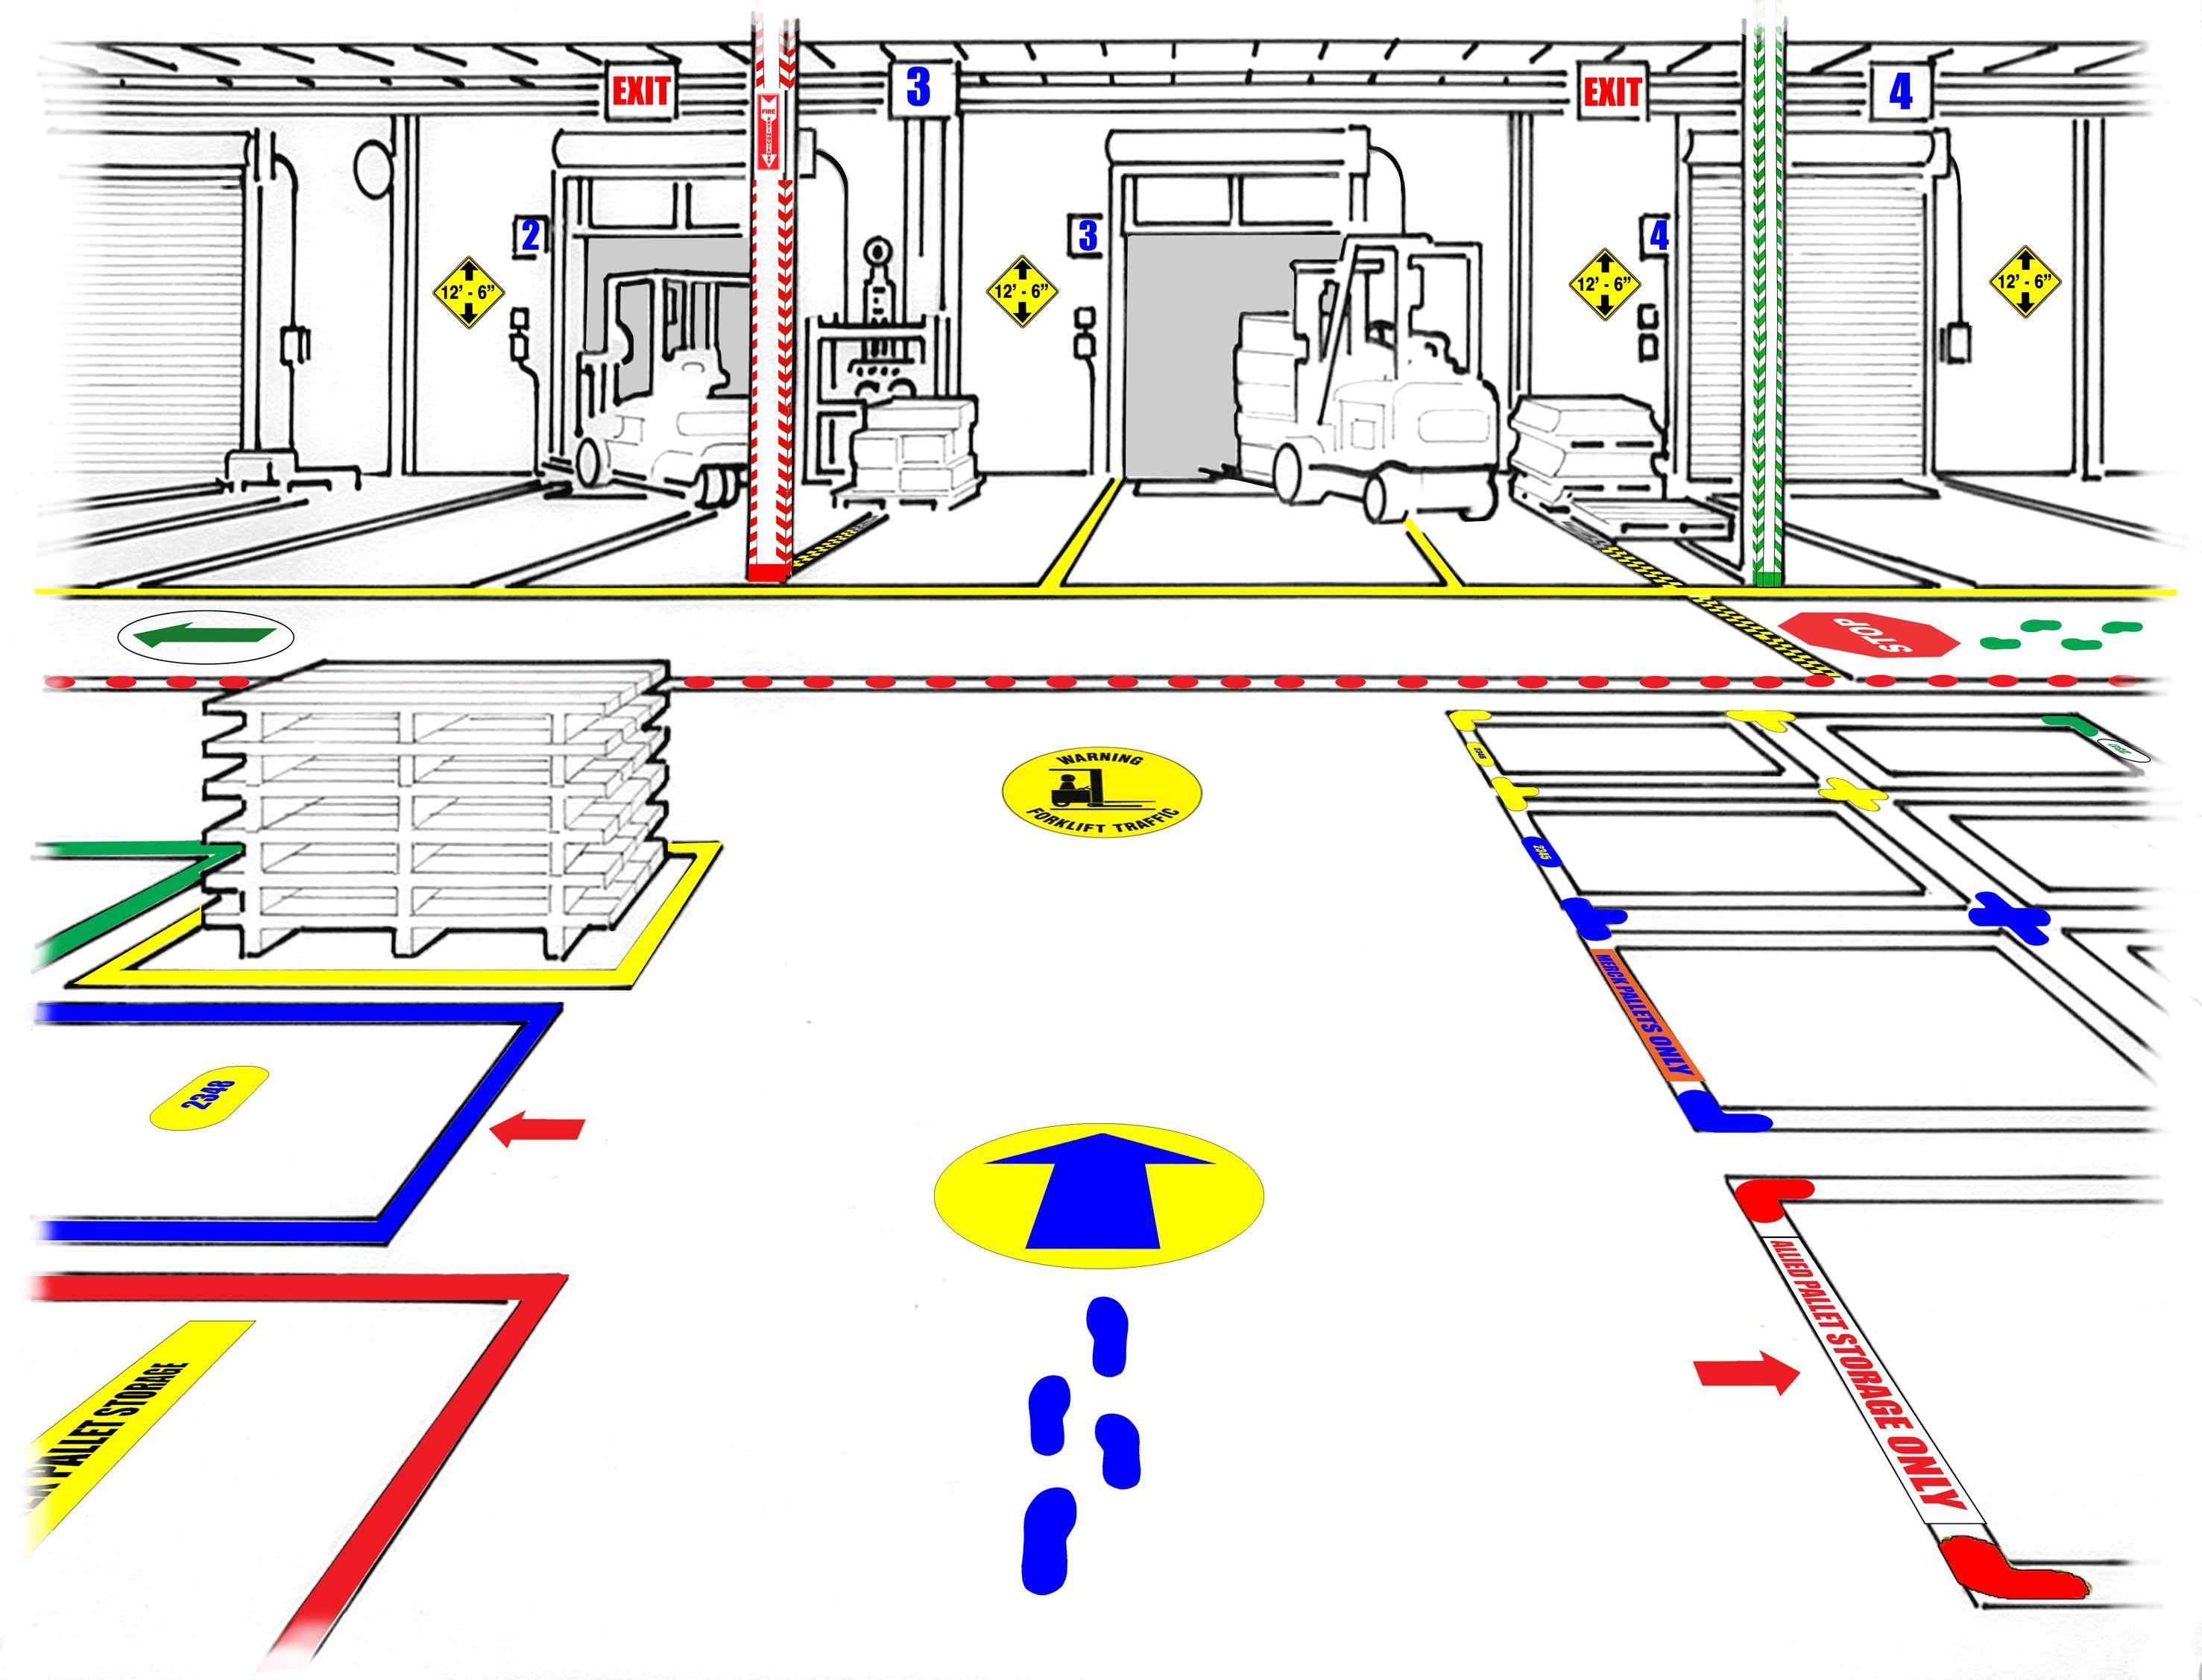 floor marking tape Visual factory, Warehouse layout